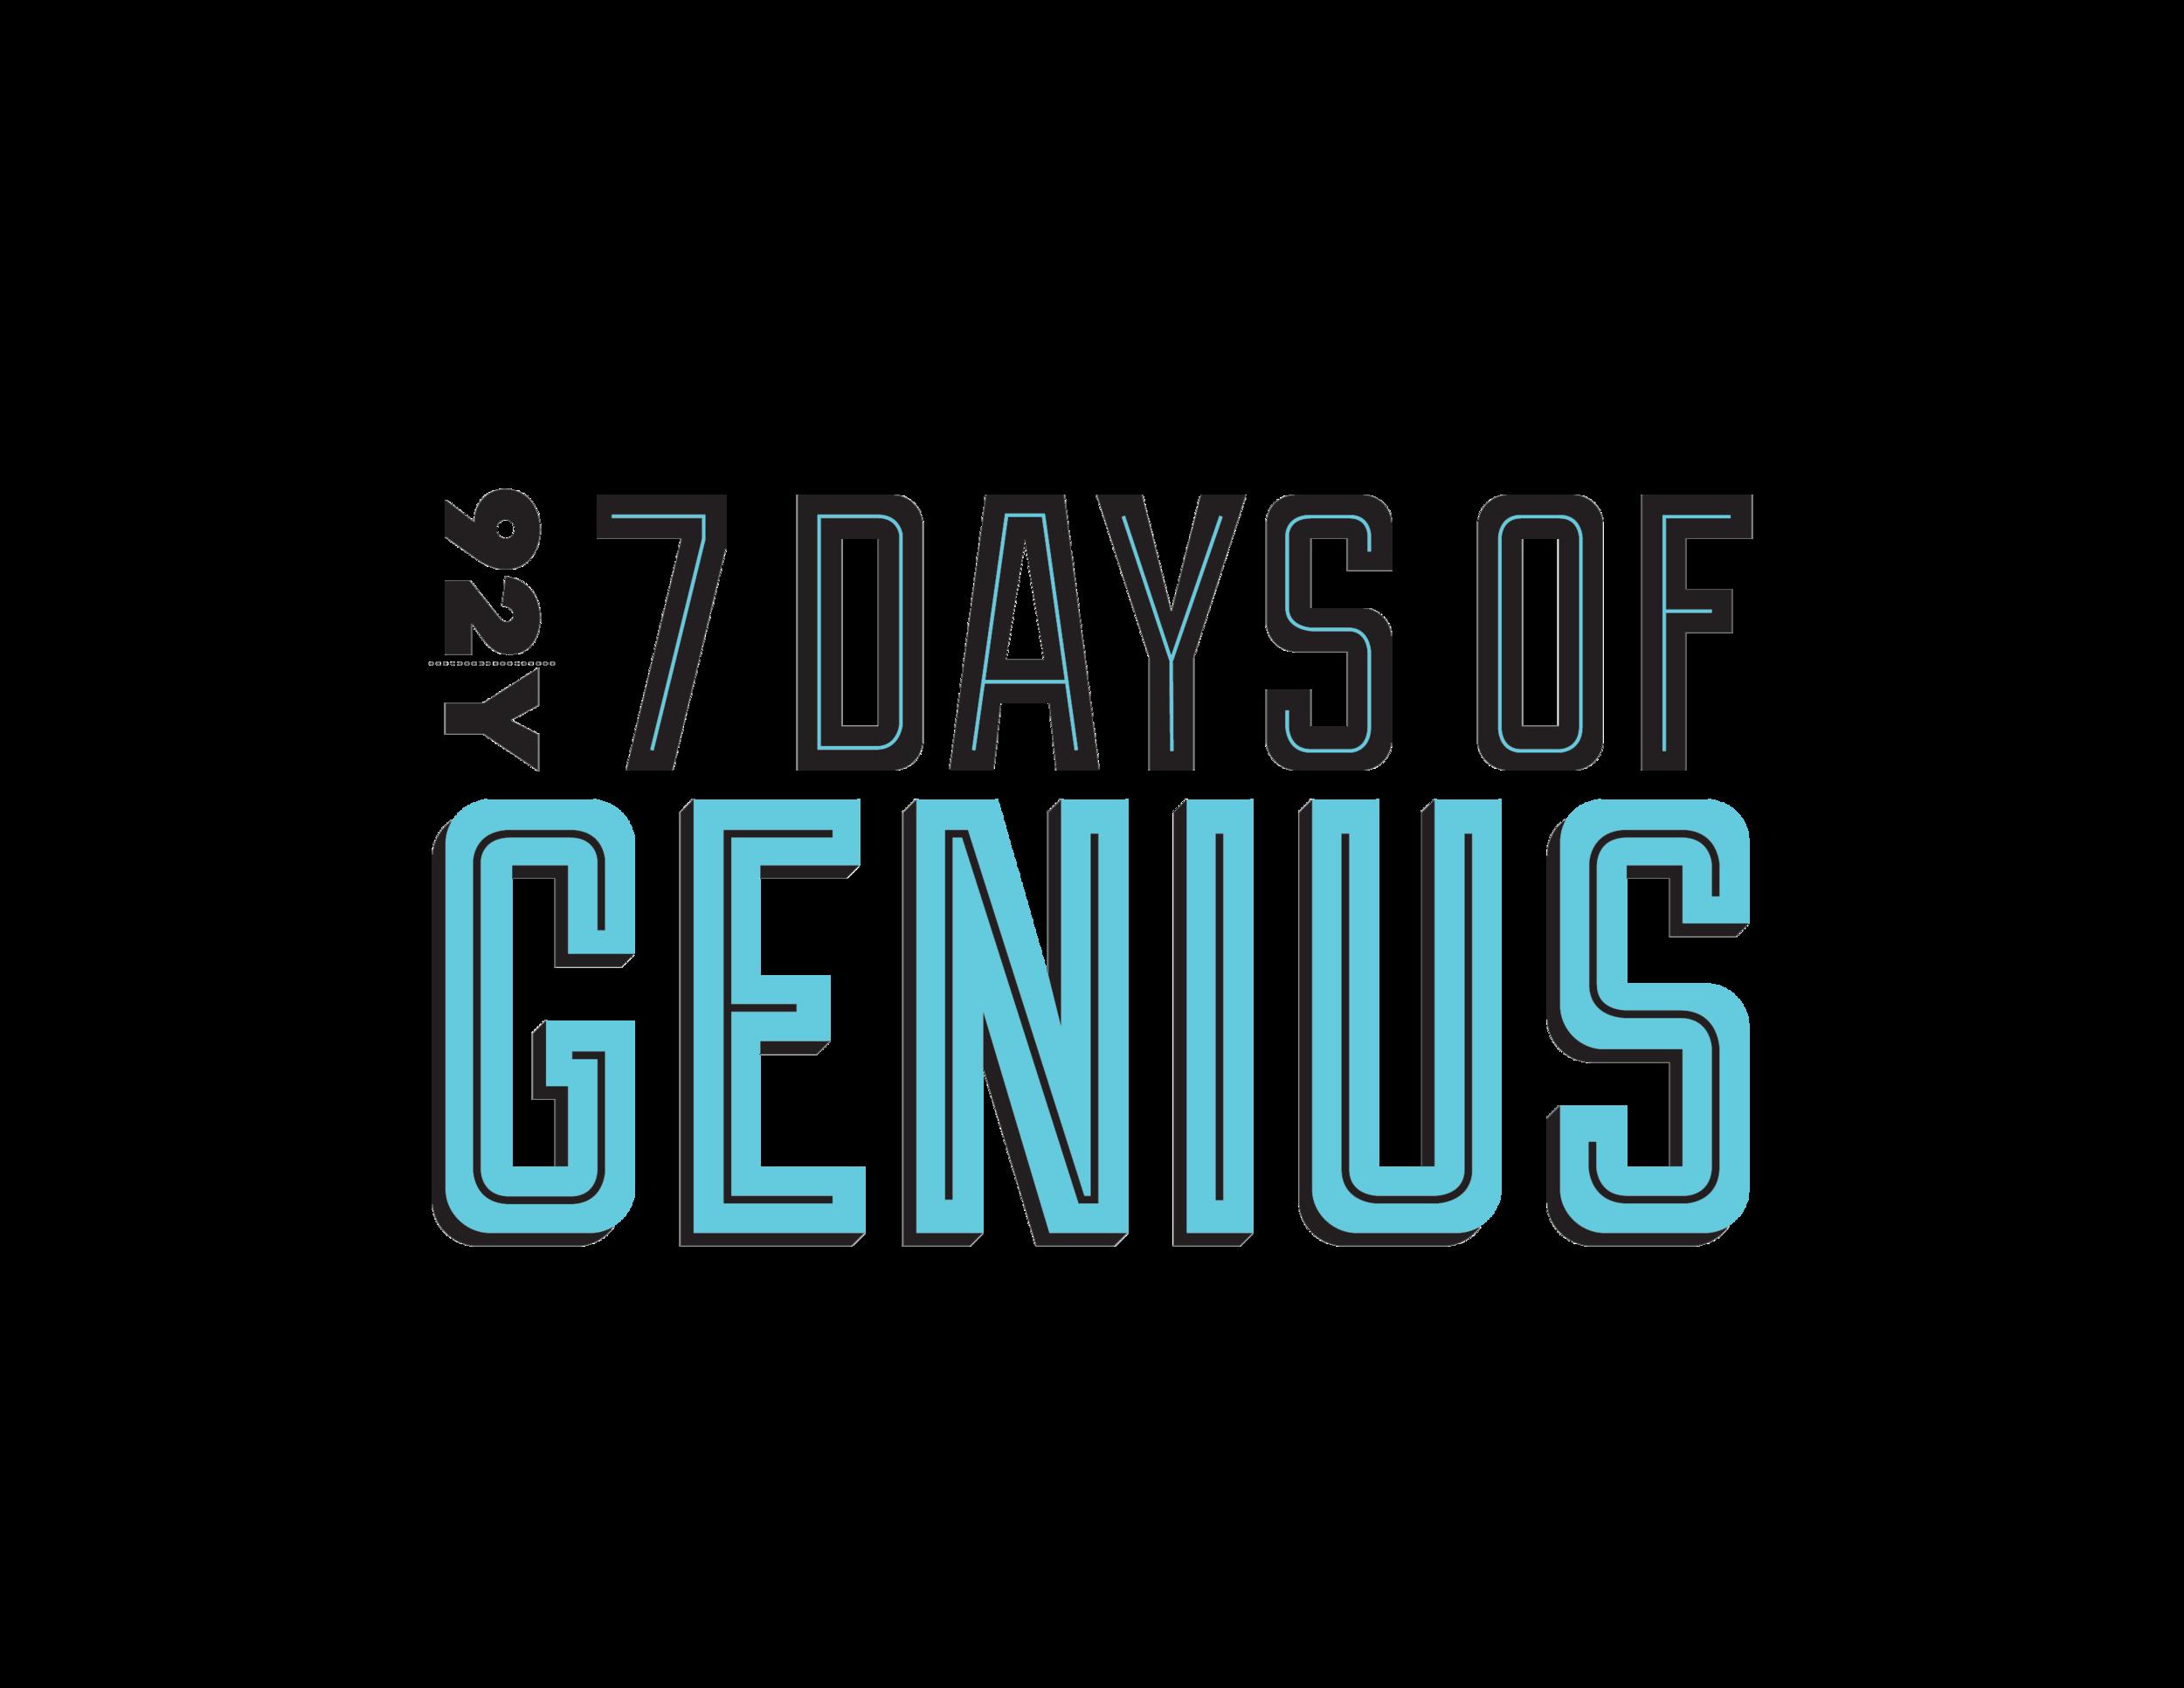 7DO_Genius_Horiz_4C-01.jpg